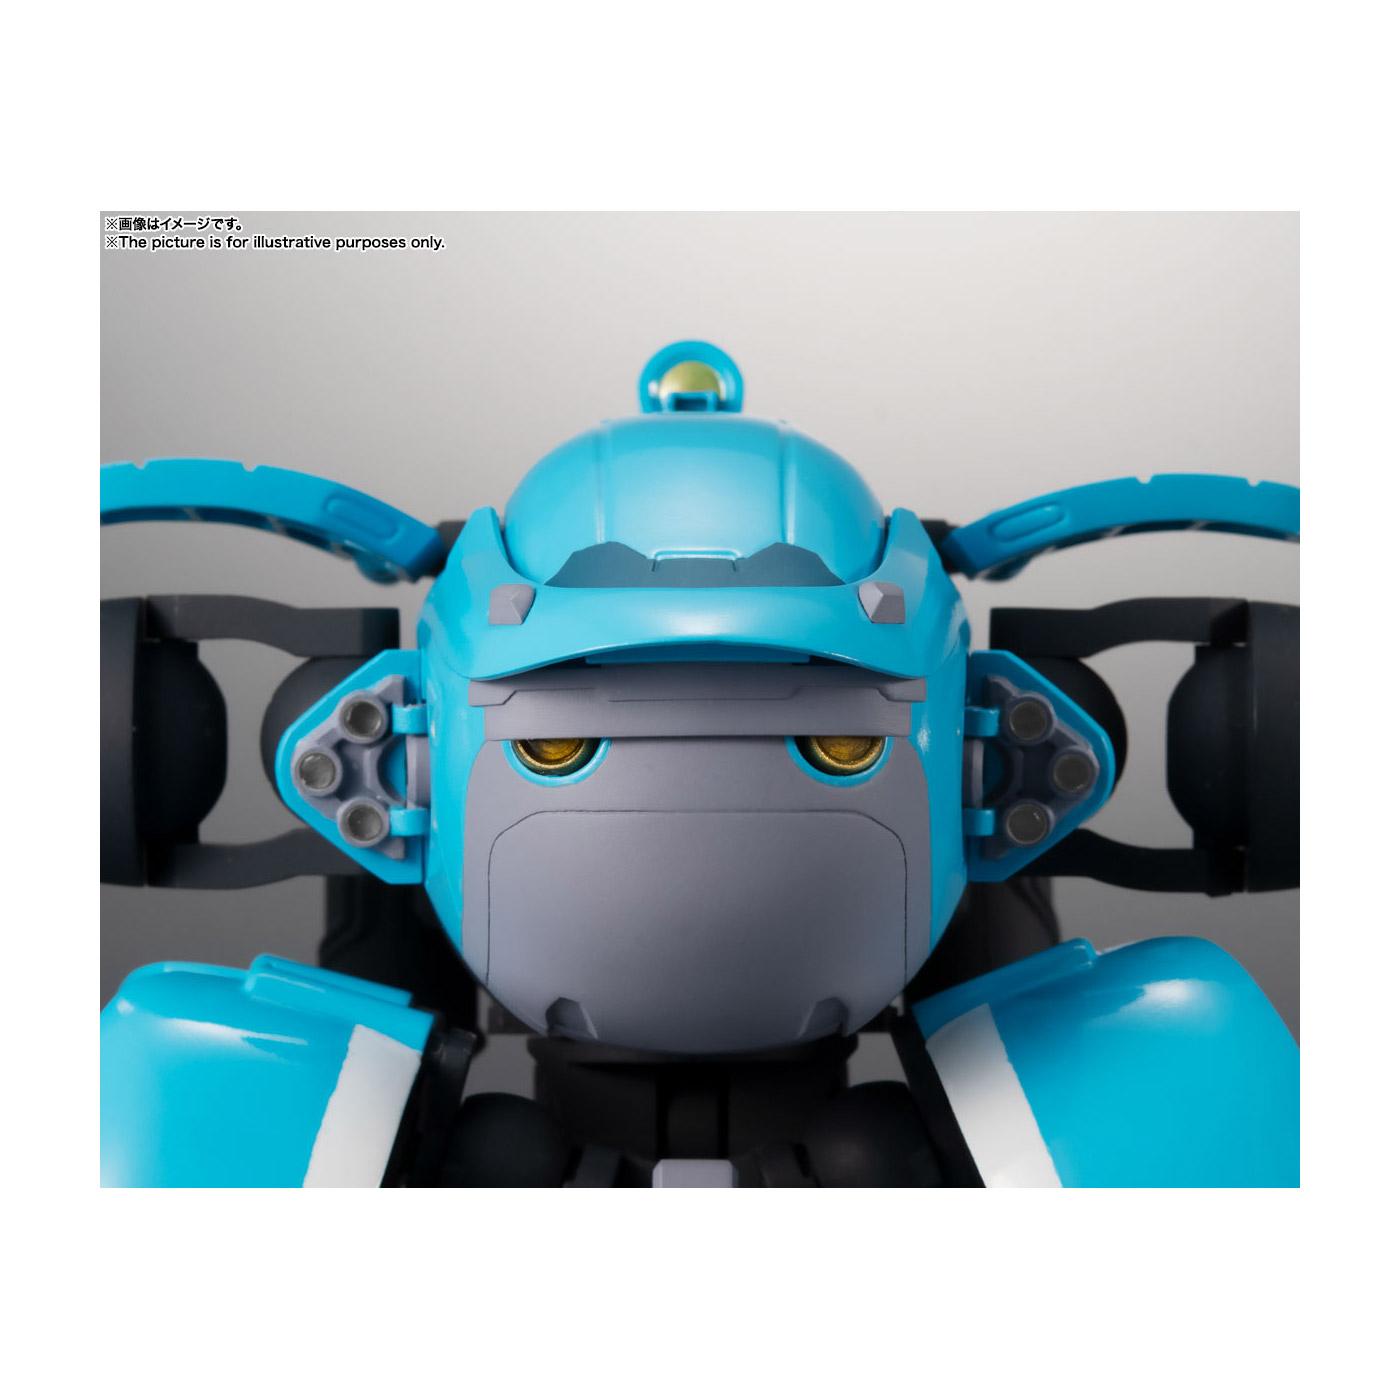 ROBOT魂 [SIDE MB] サクガン ビッグトニー_10